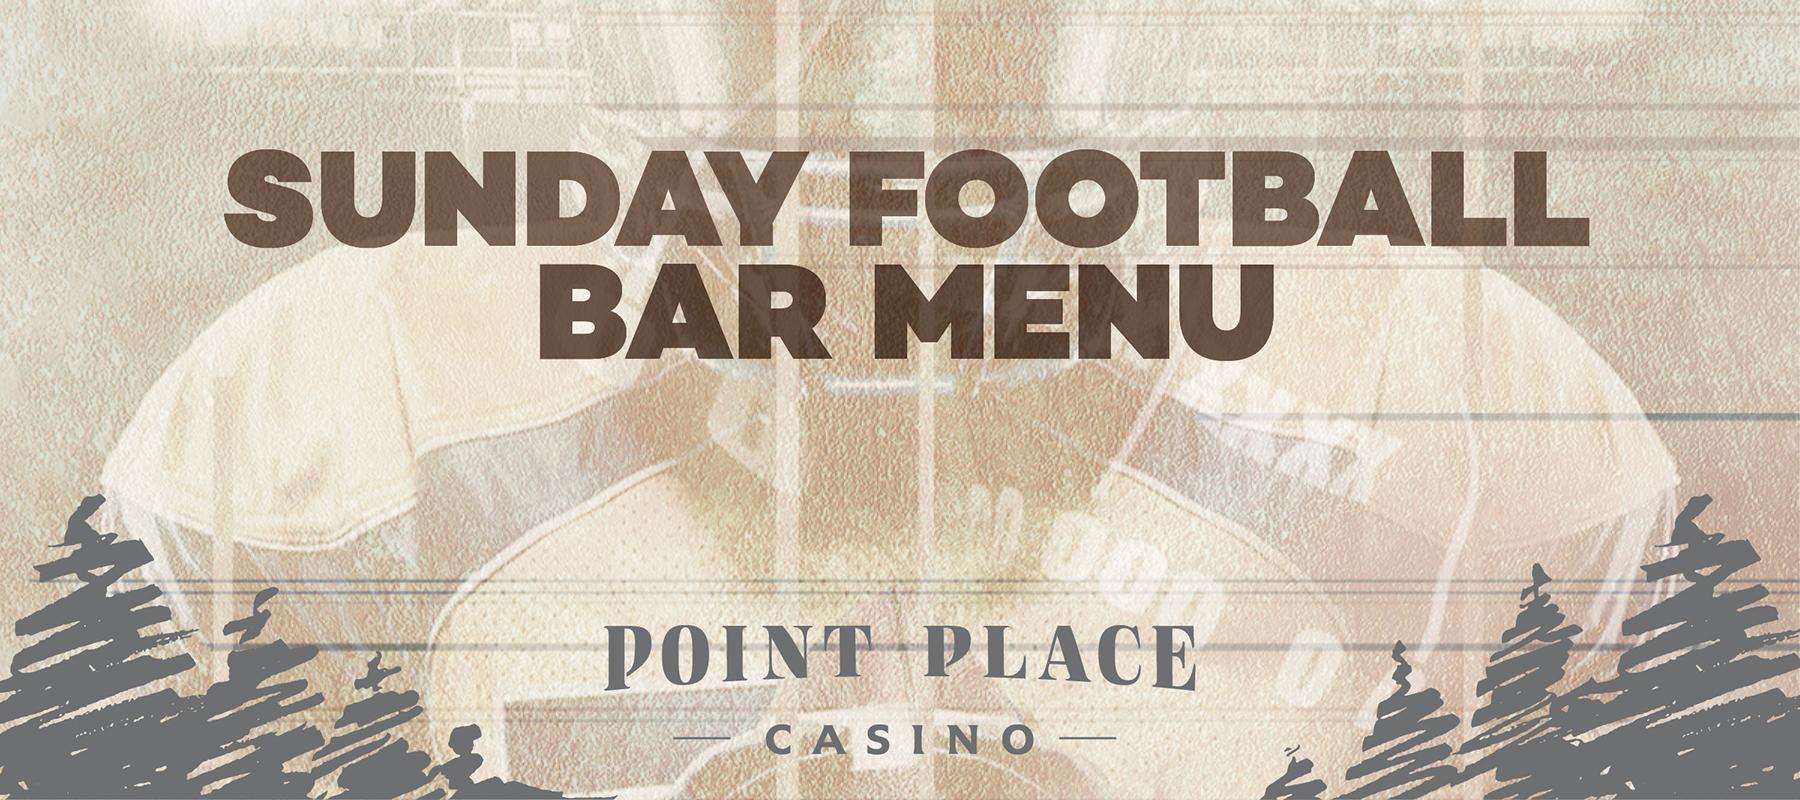 Sunday Football Bar Menu